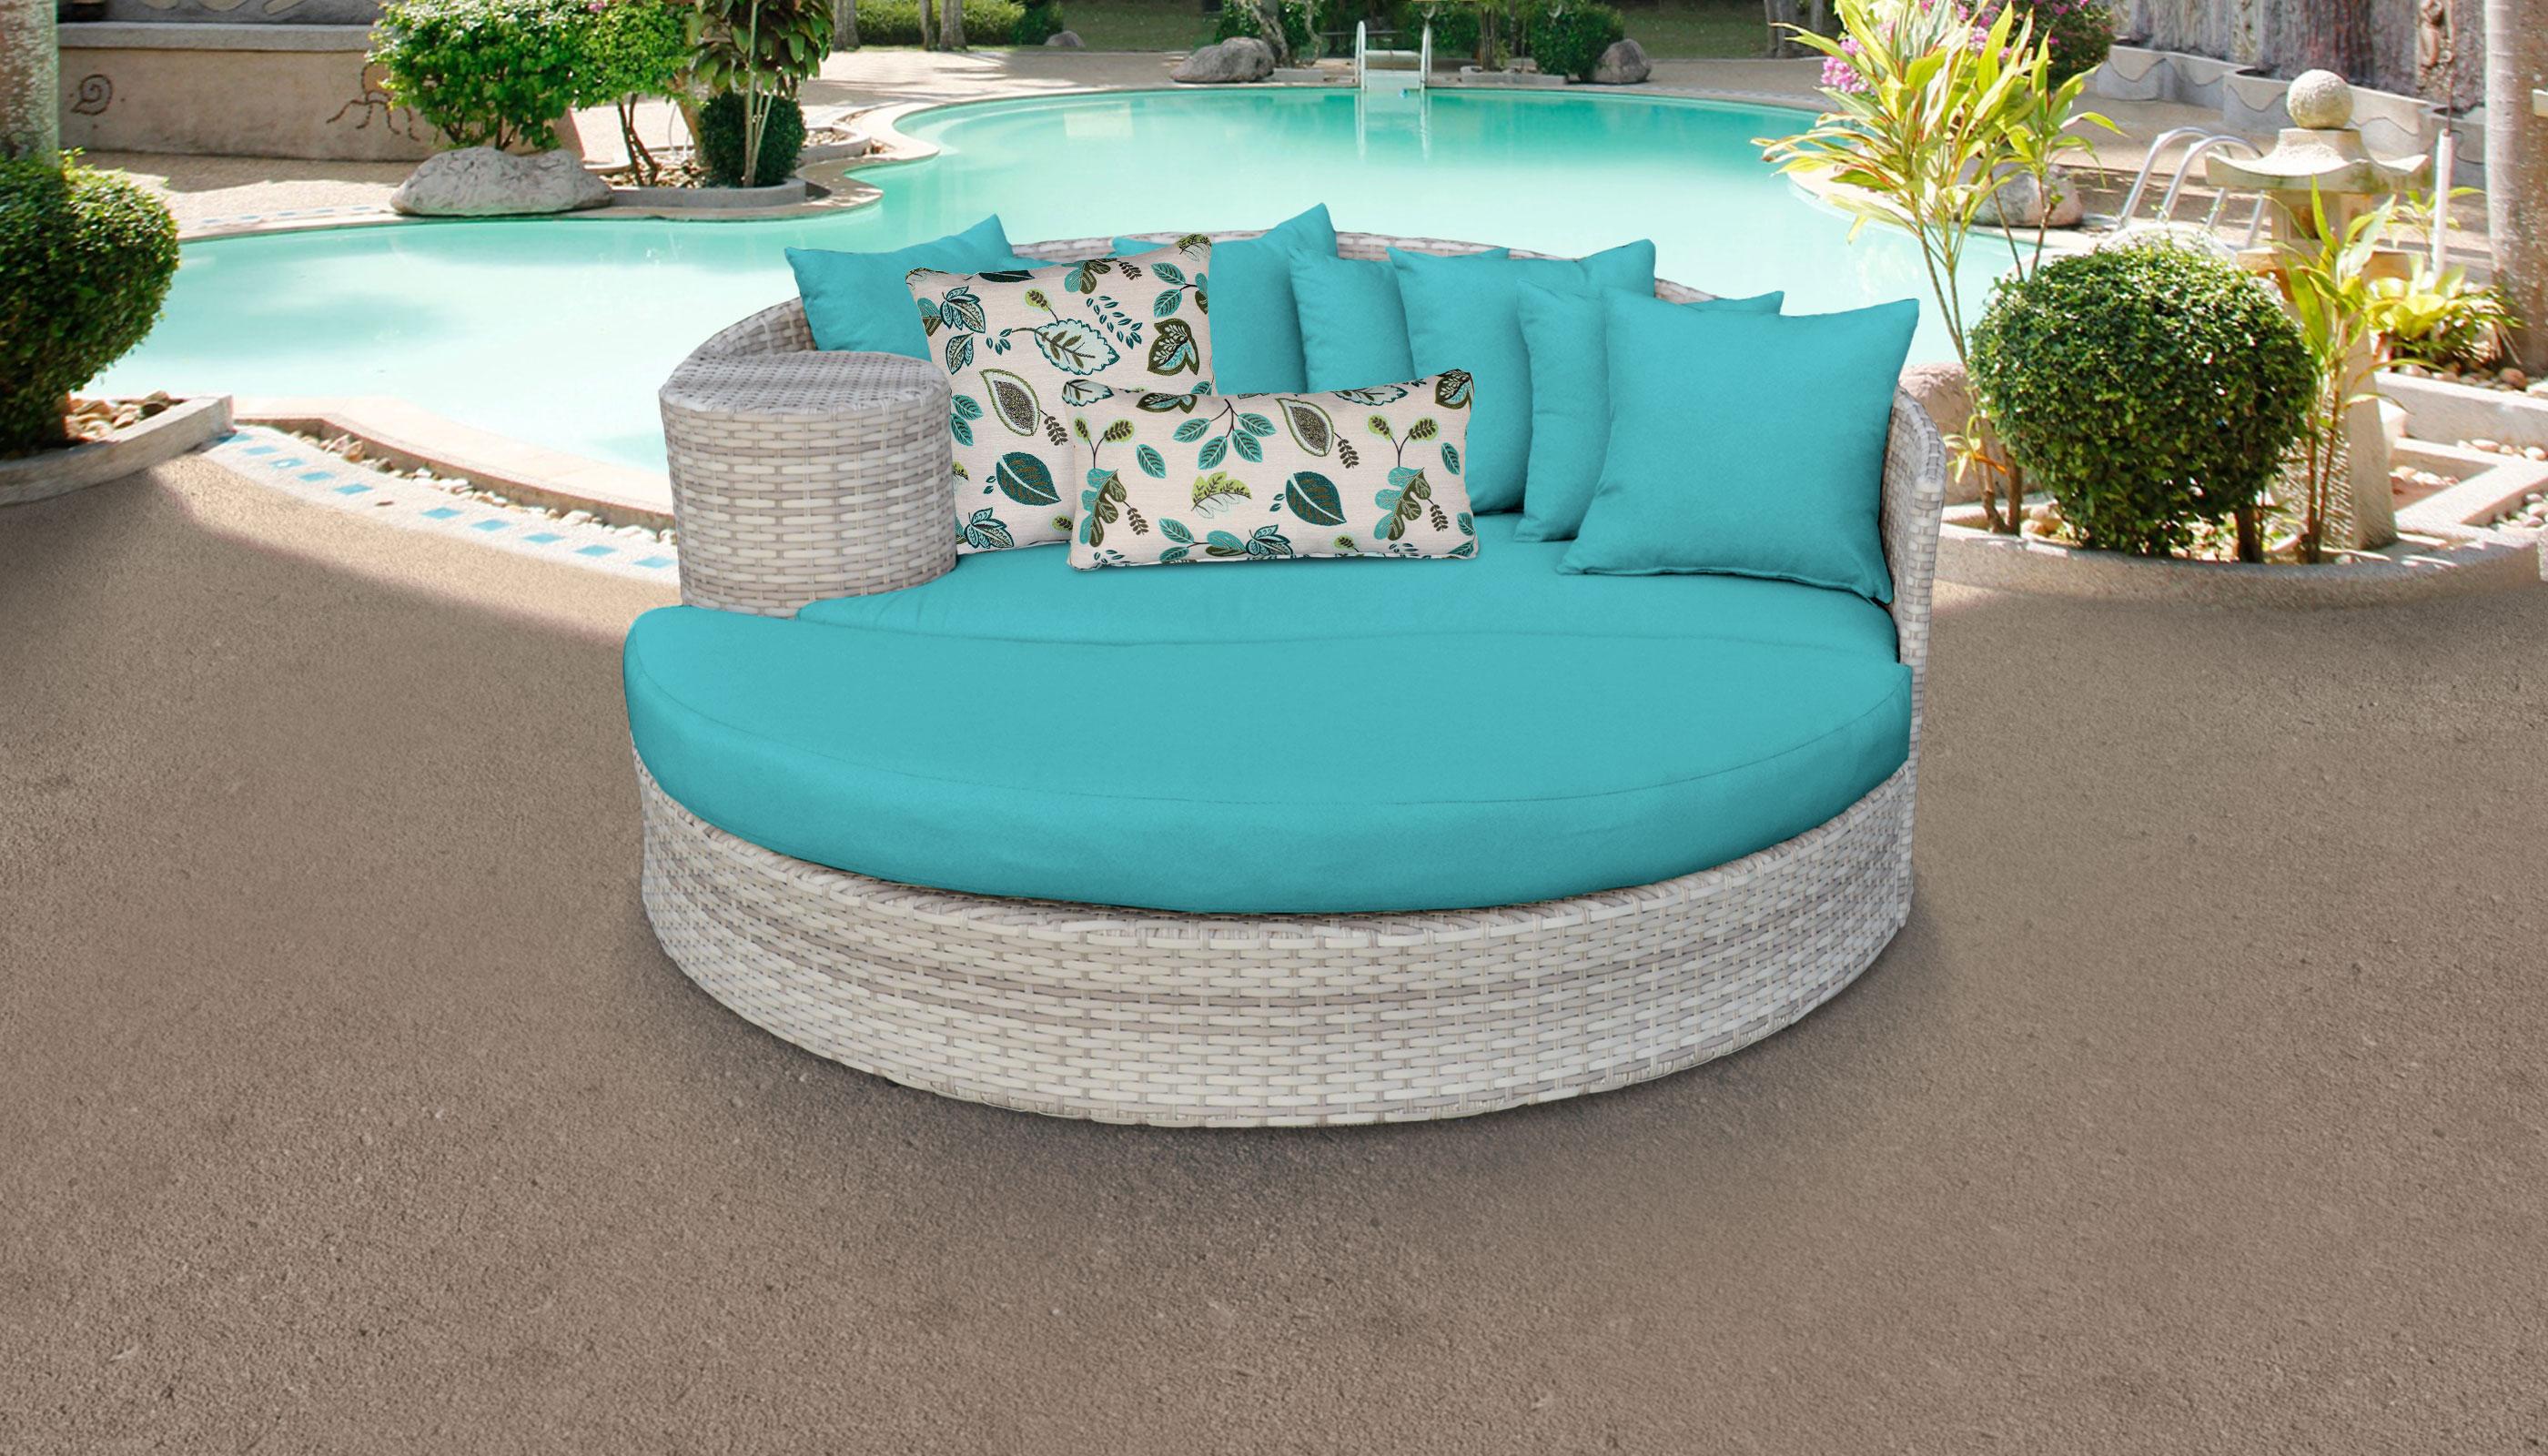 Fairmont Circular Sun Bed Outdoor Wicker Patio Furniture